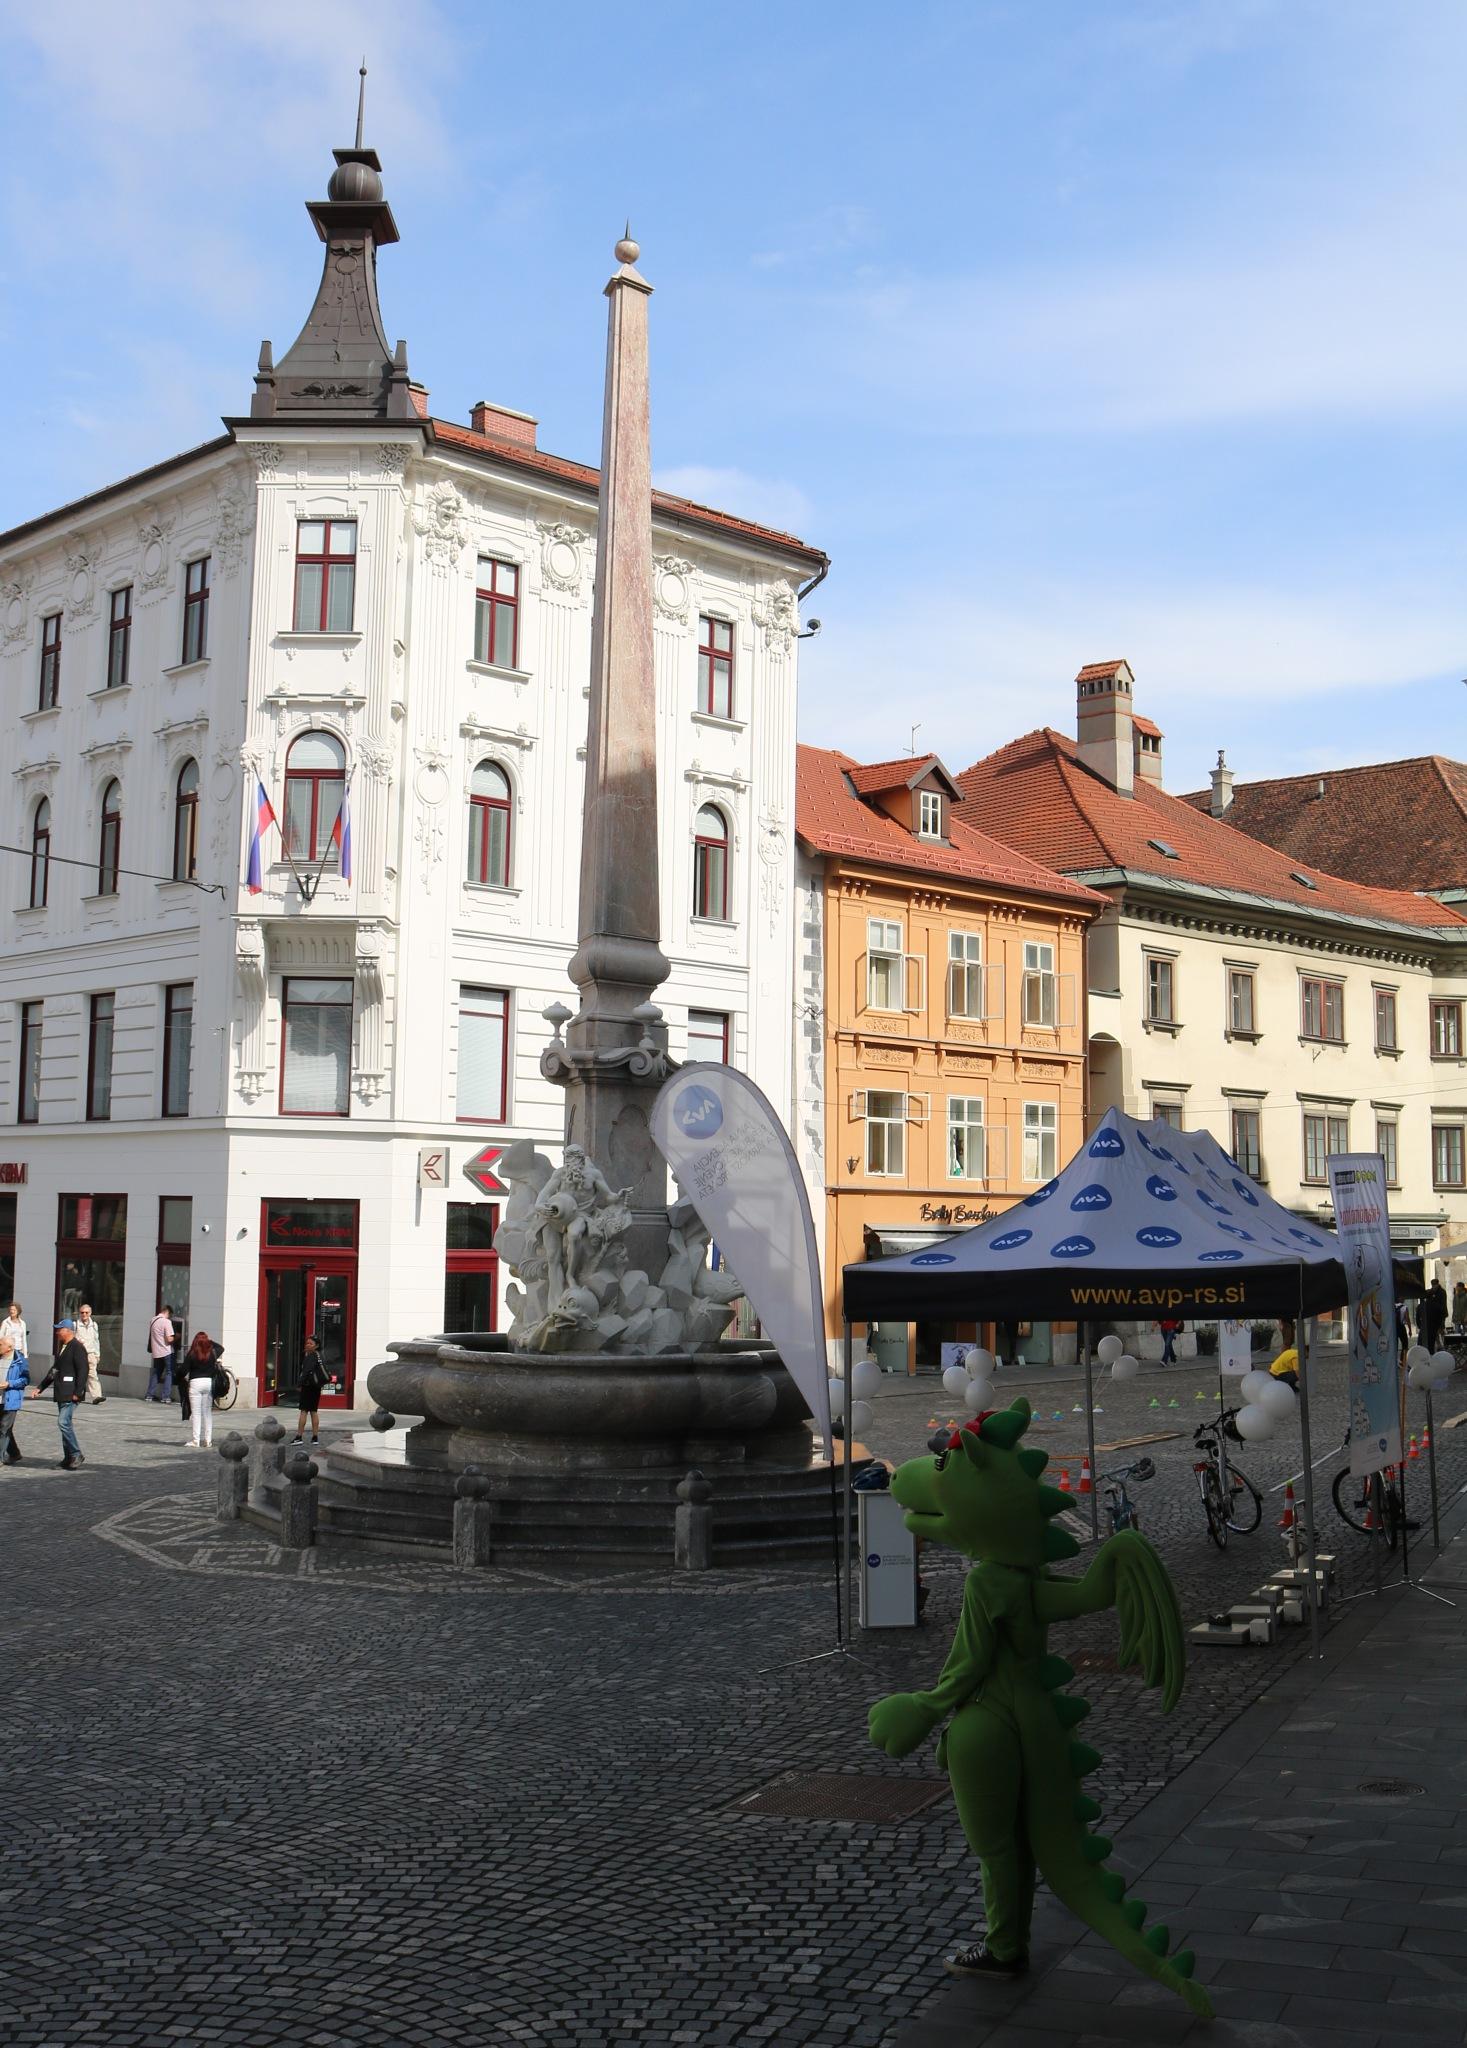 Ljubljana, Slovenia by zvnktomasevic